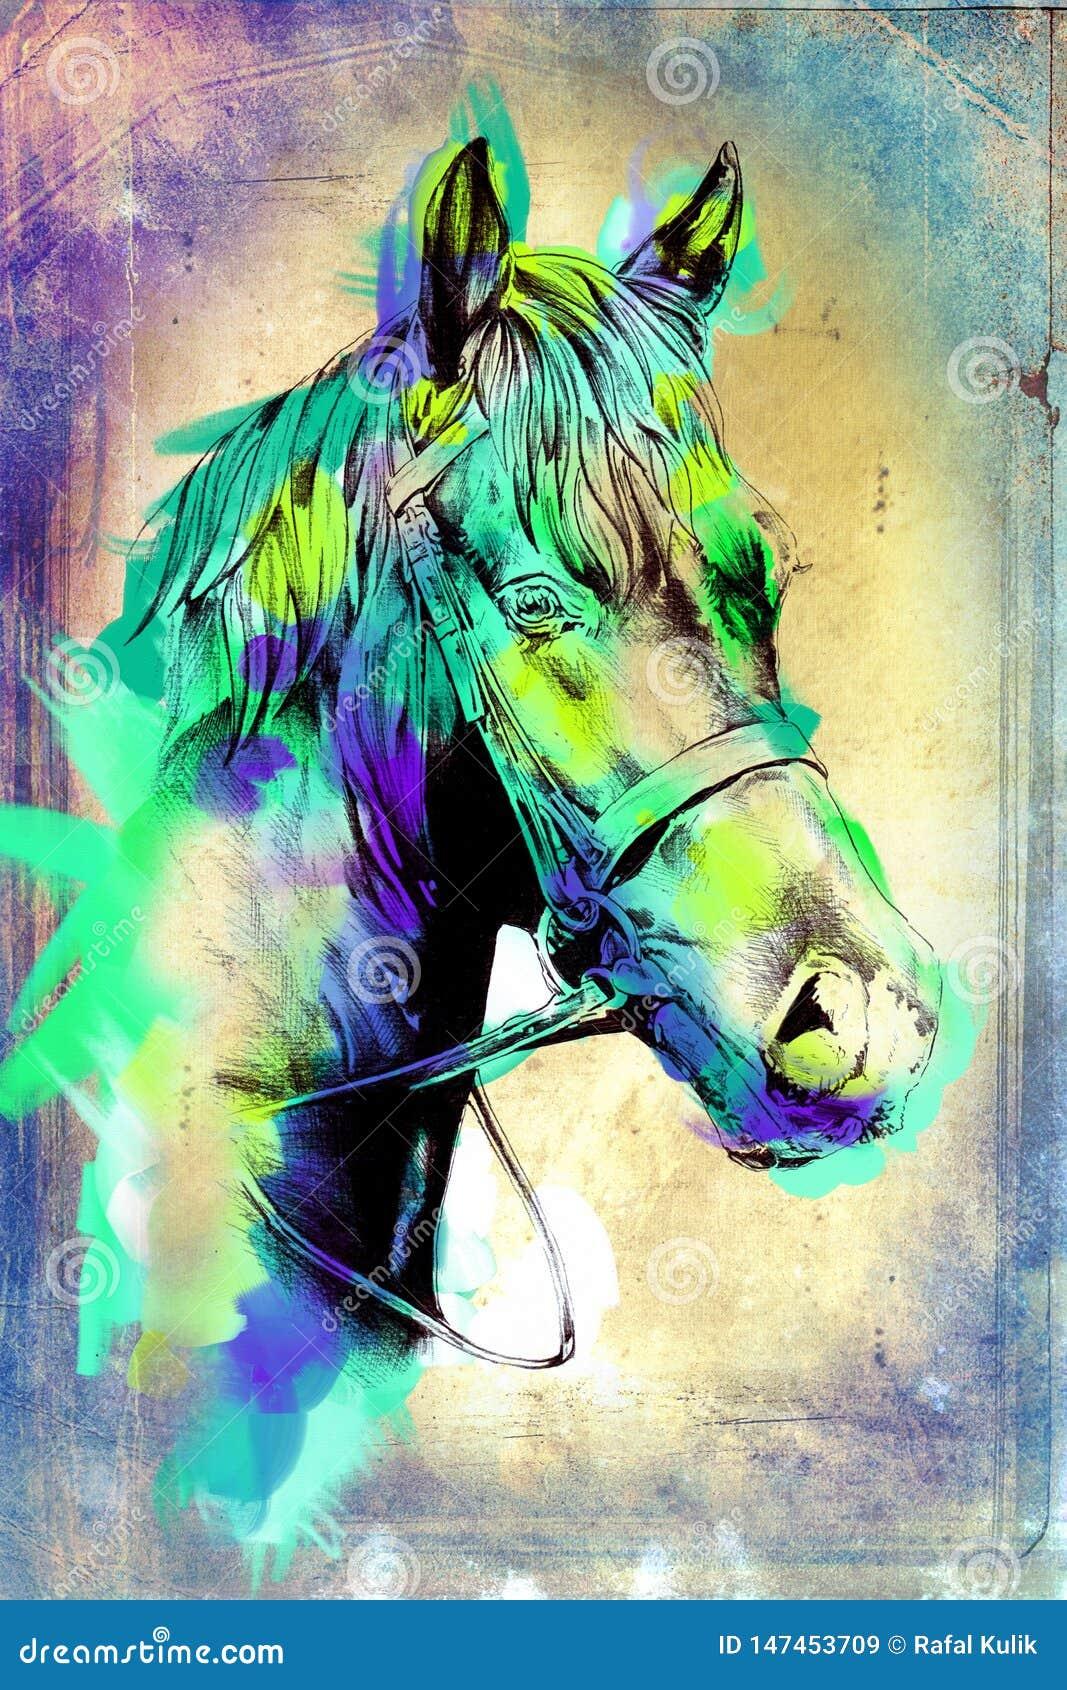 Original Oil Painting Of A Fine Arabian Horse Funny Artwork Stock Illustration Illustration Of Horse Brush 147453709